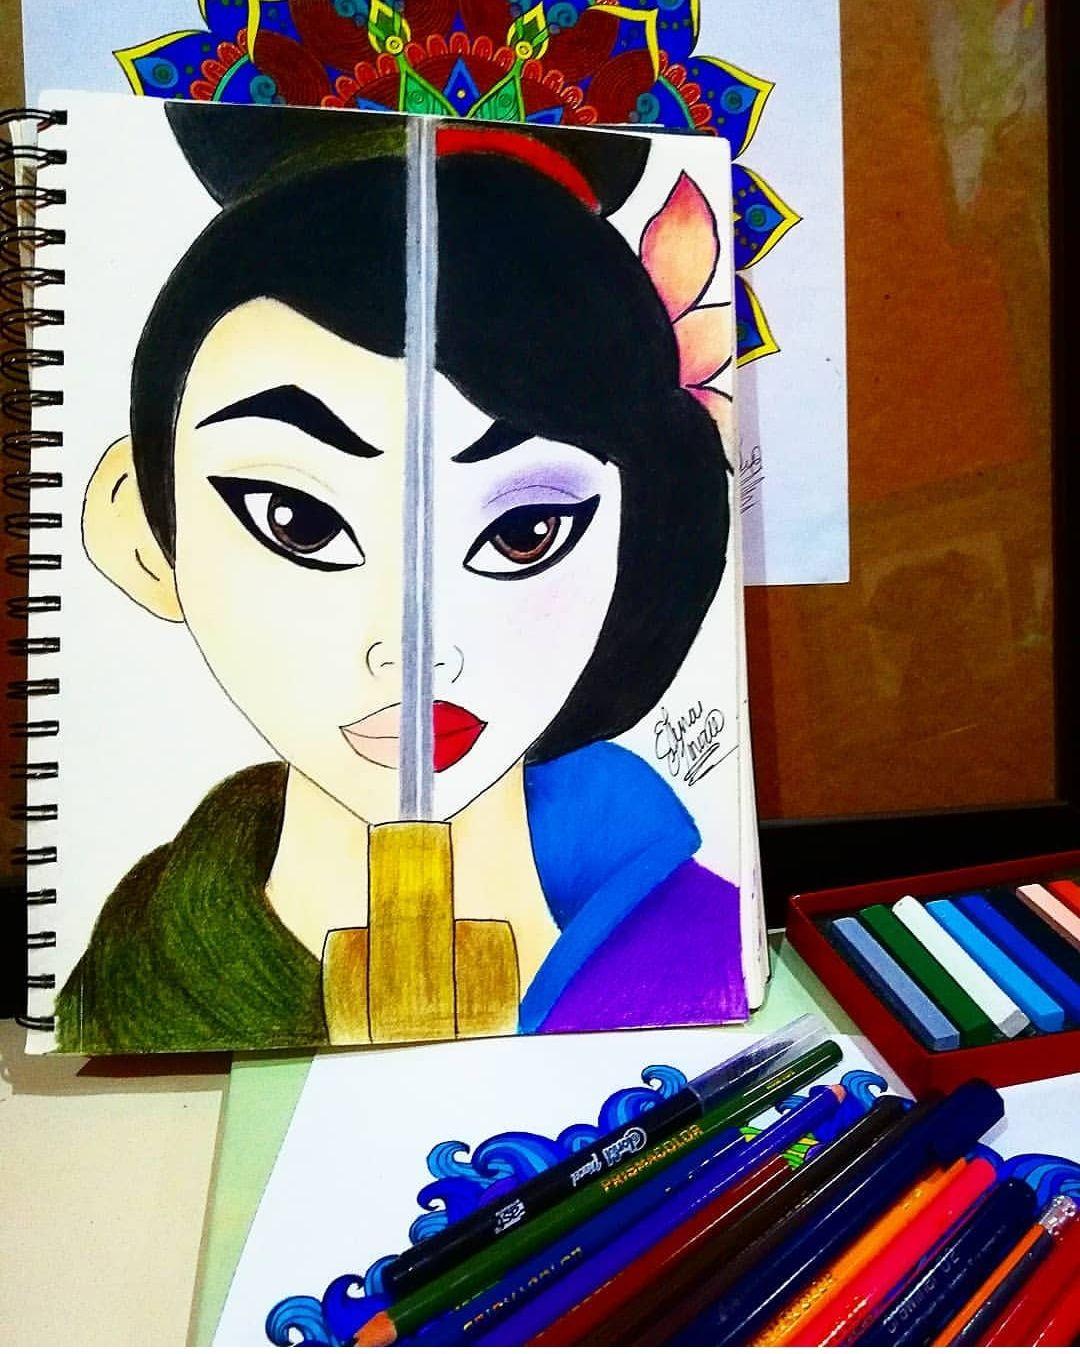 Dibujo De Hua Mulan Realizado Con Lapices De Colores